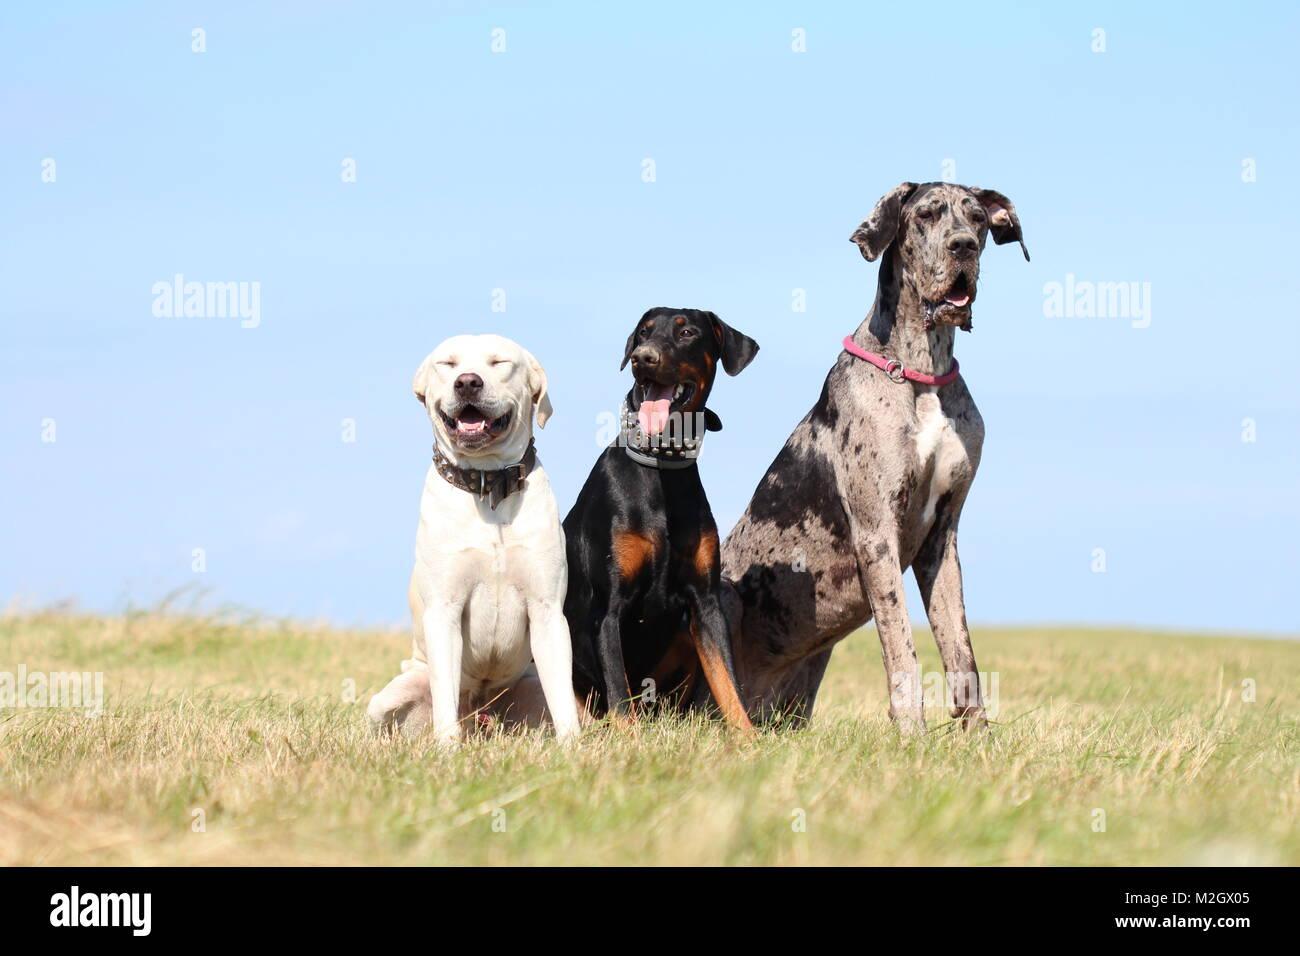 3 dogs sitting on the ground - doberman pincher, great dane, labrador / amstaff - Stock Image